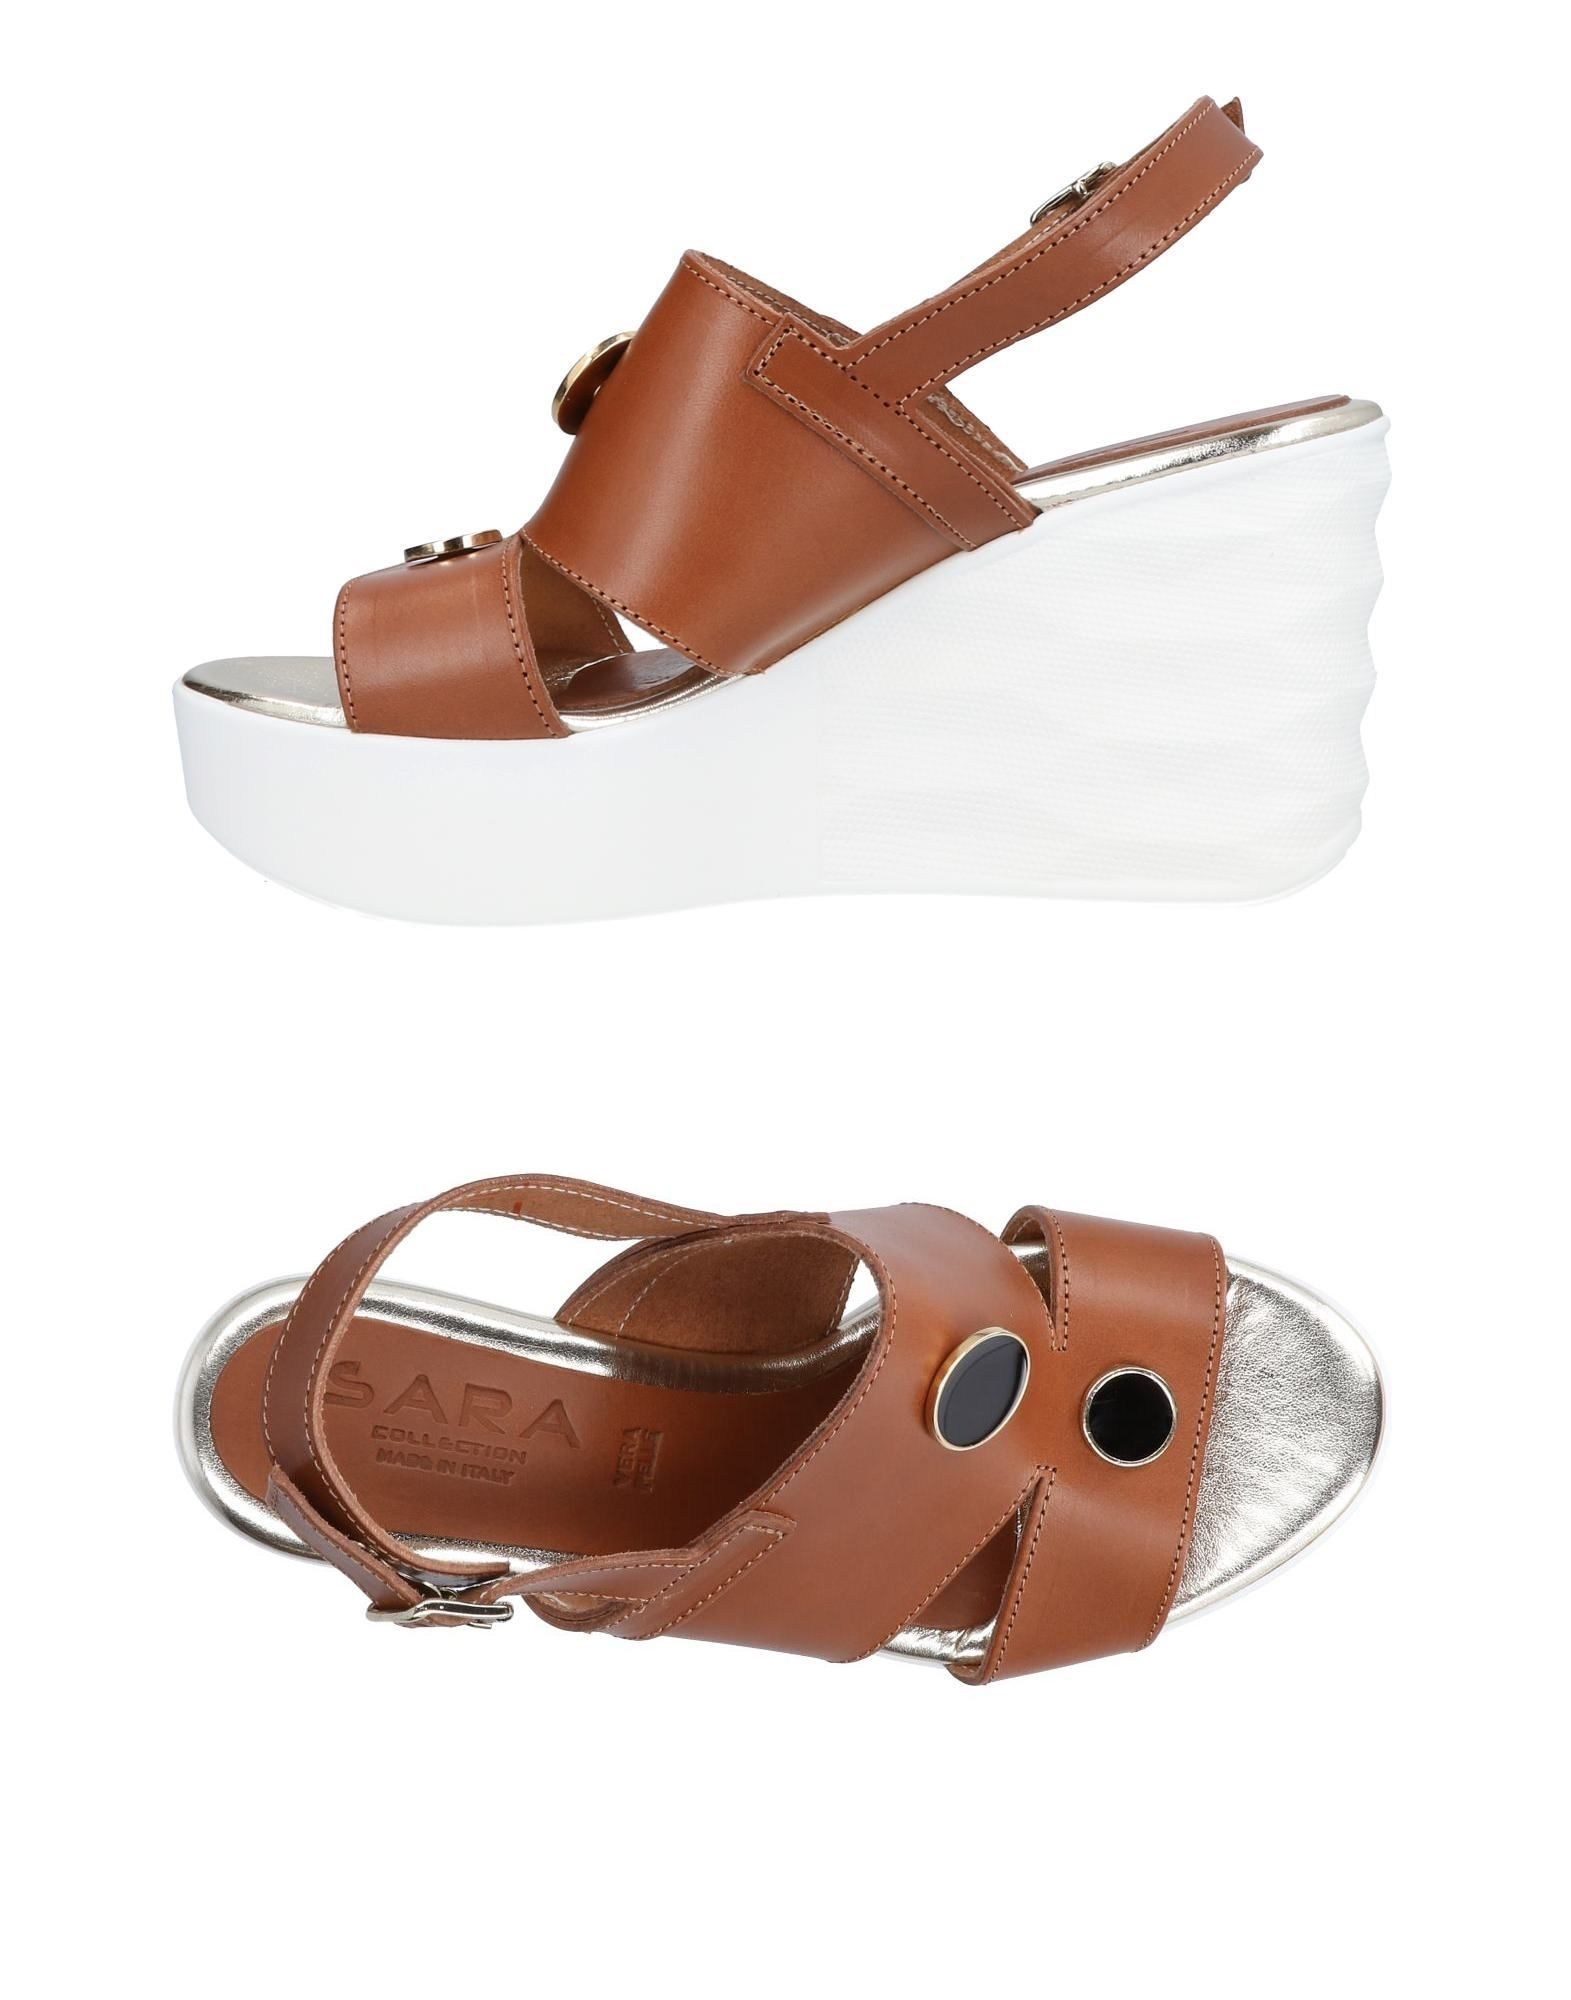 Sara Sandalen Damen  11460796GN Gute Qualität beliebte Schuhe